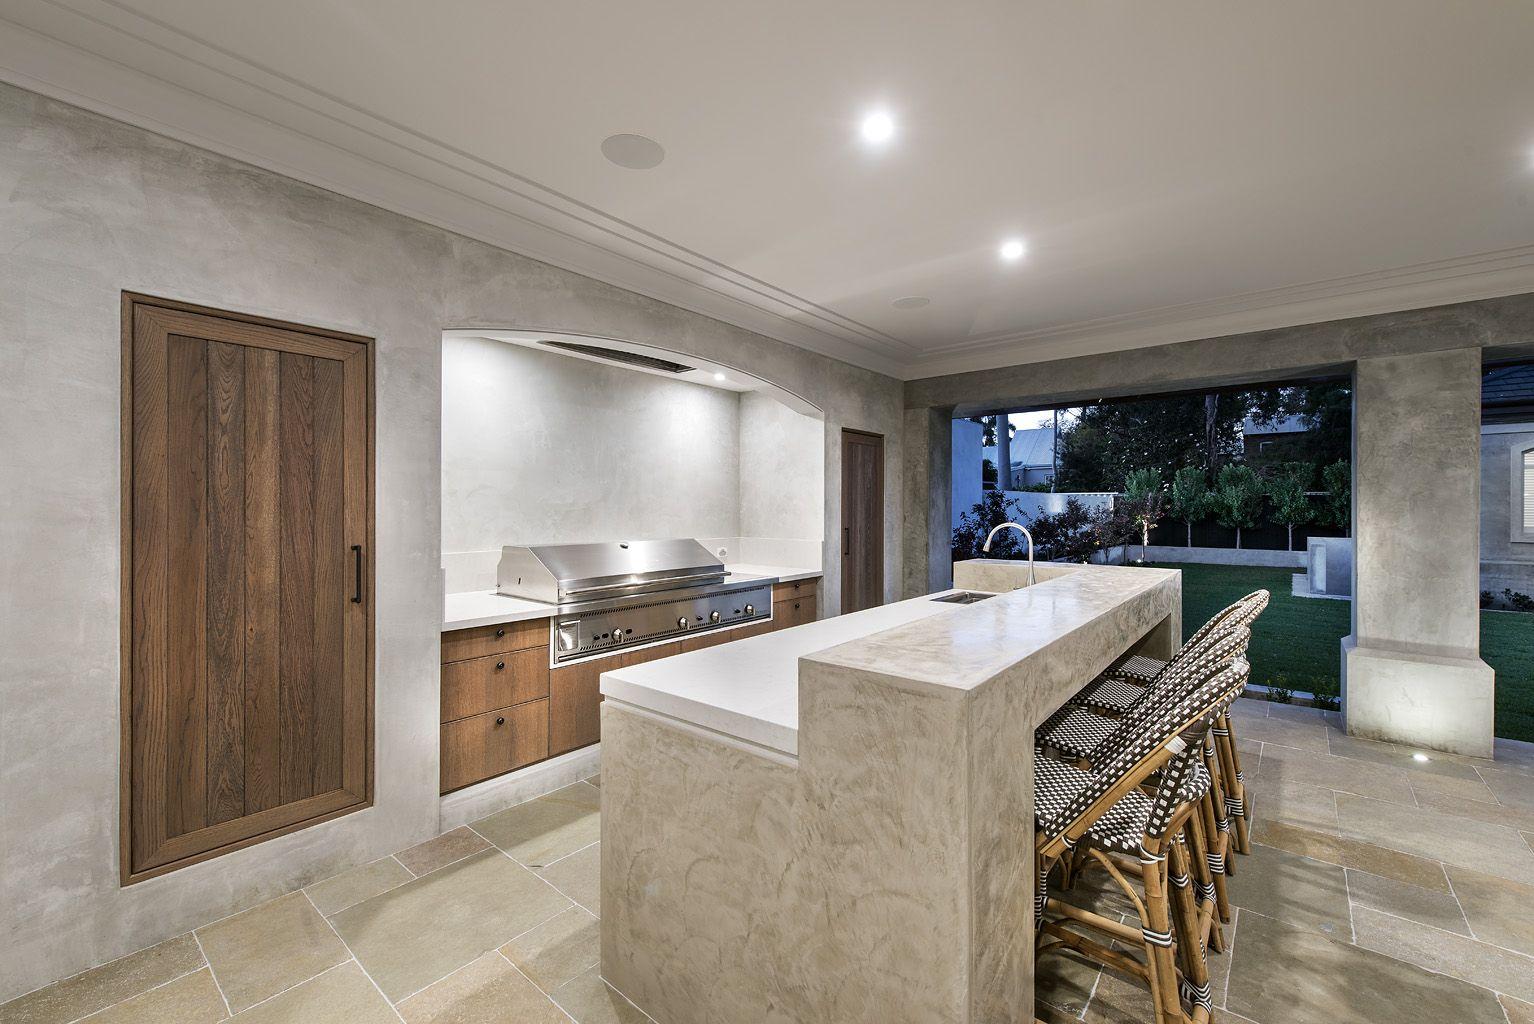 Zorzi Custom Luxury Home Luxury homes, Home builders, Home